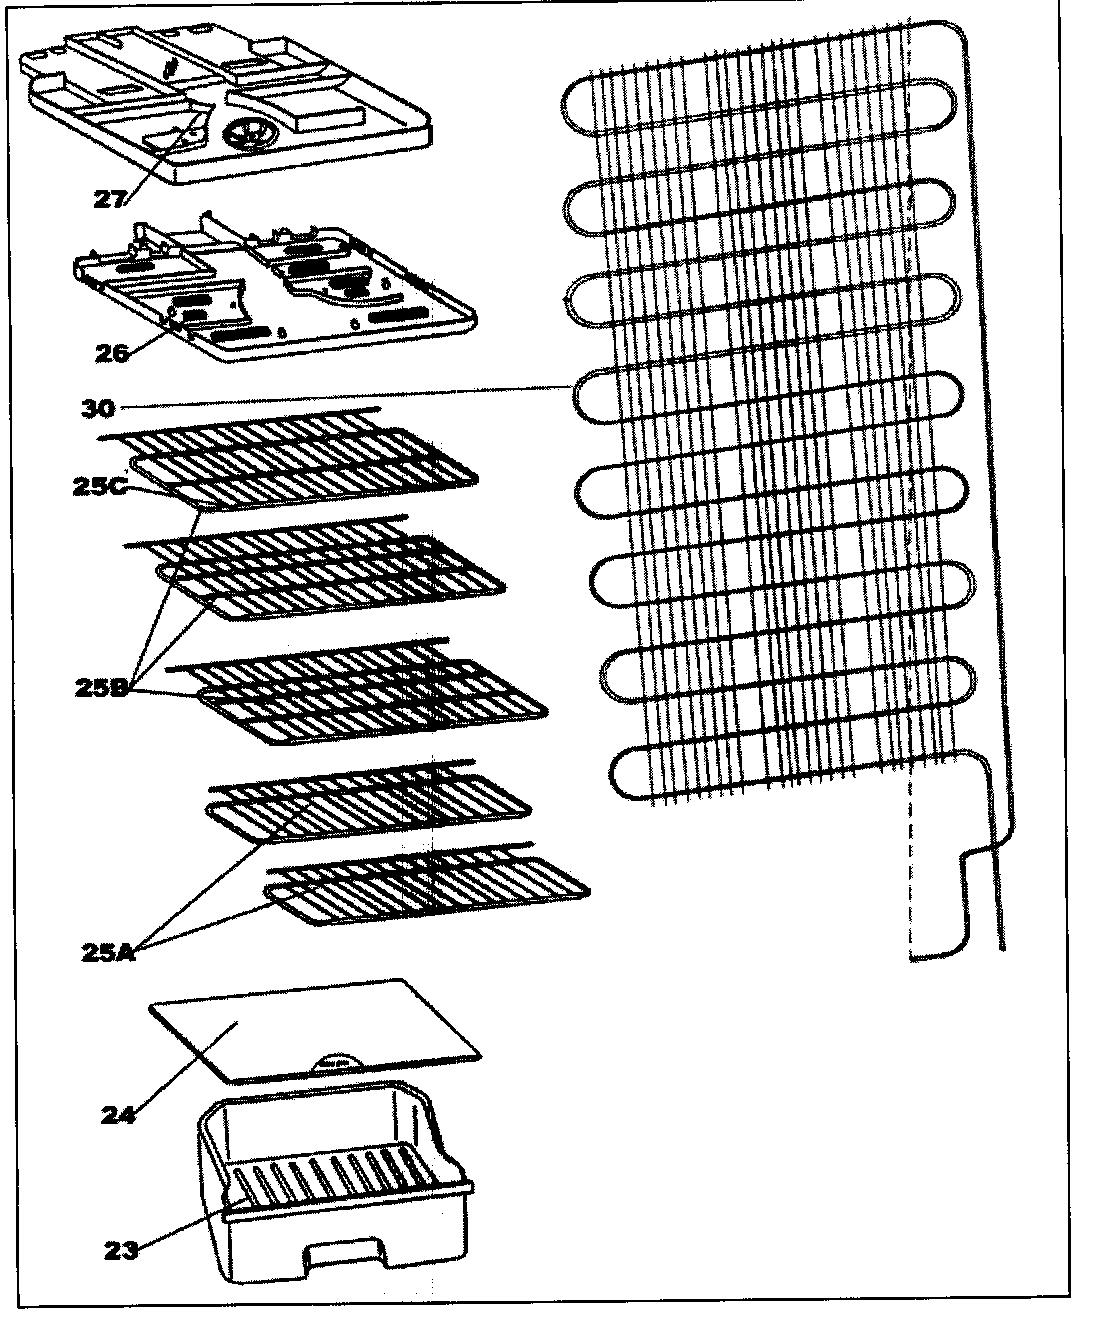 ACCESSORIES Diagram & Parts List for Model dff8801w Danby